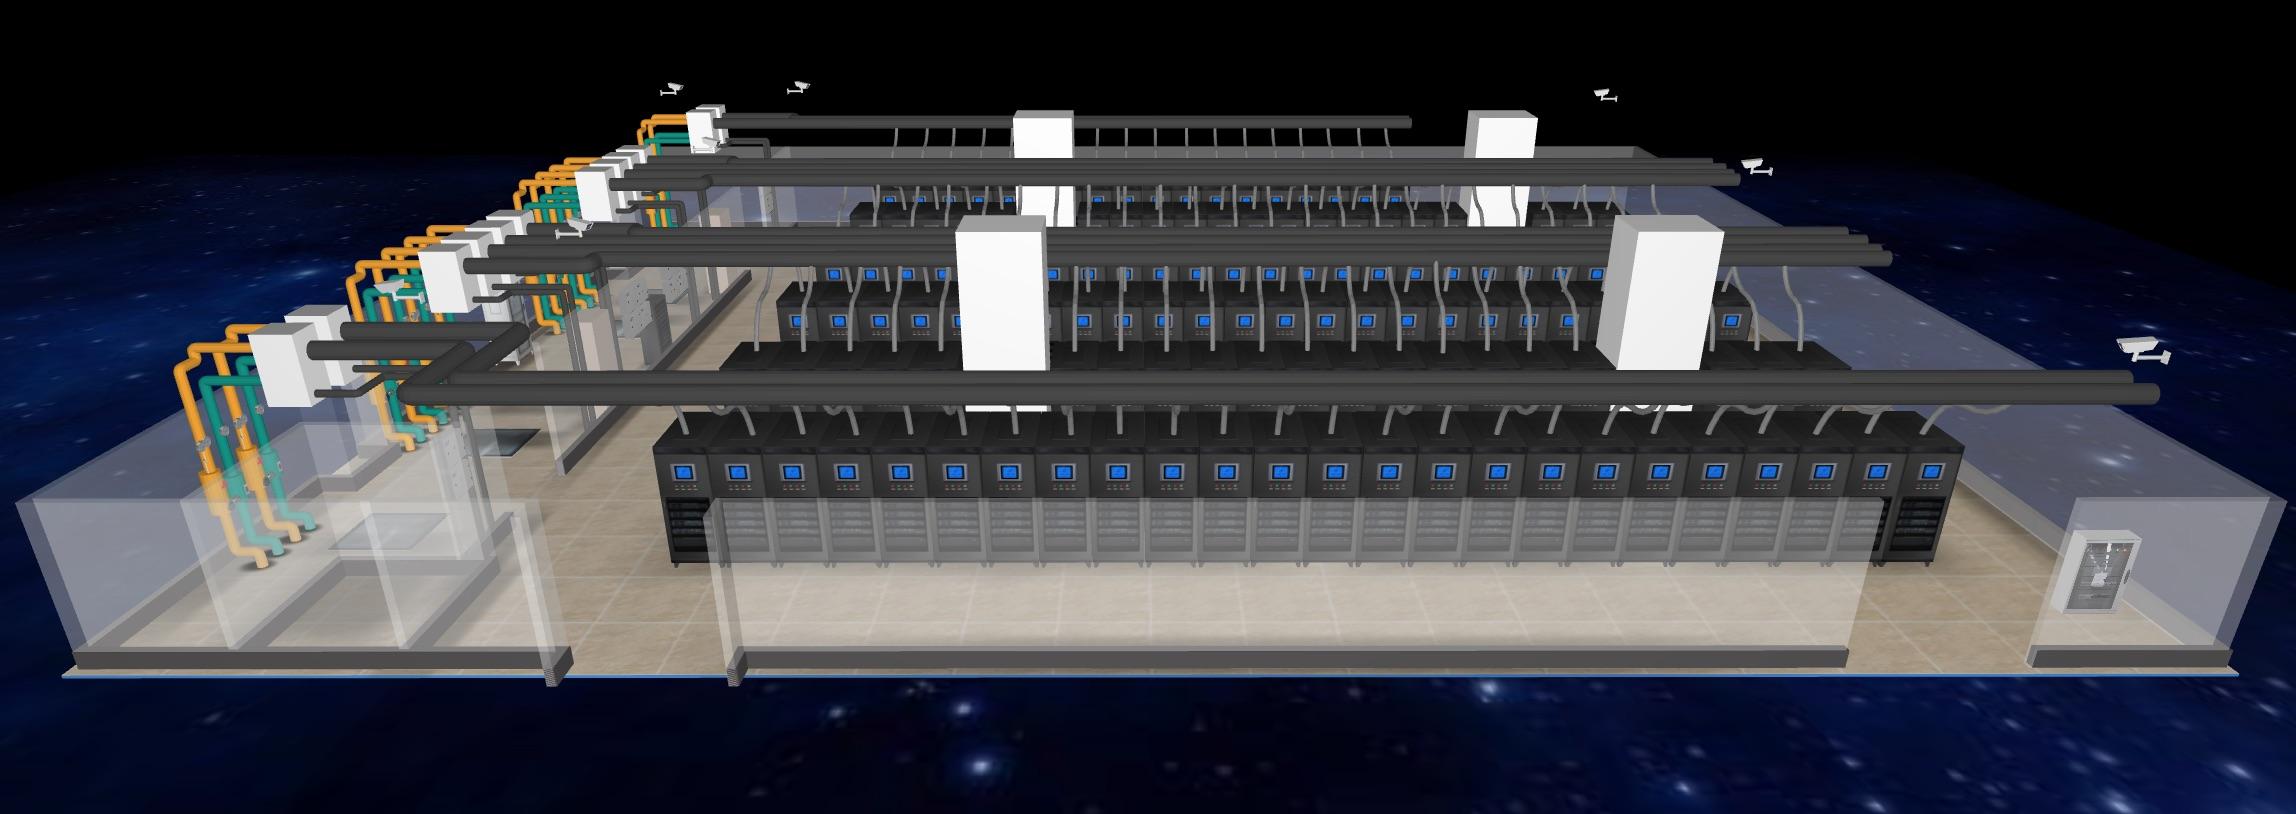 3D机房动环监控系统